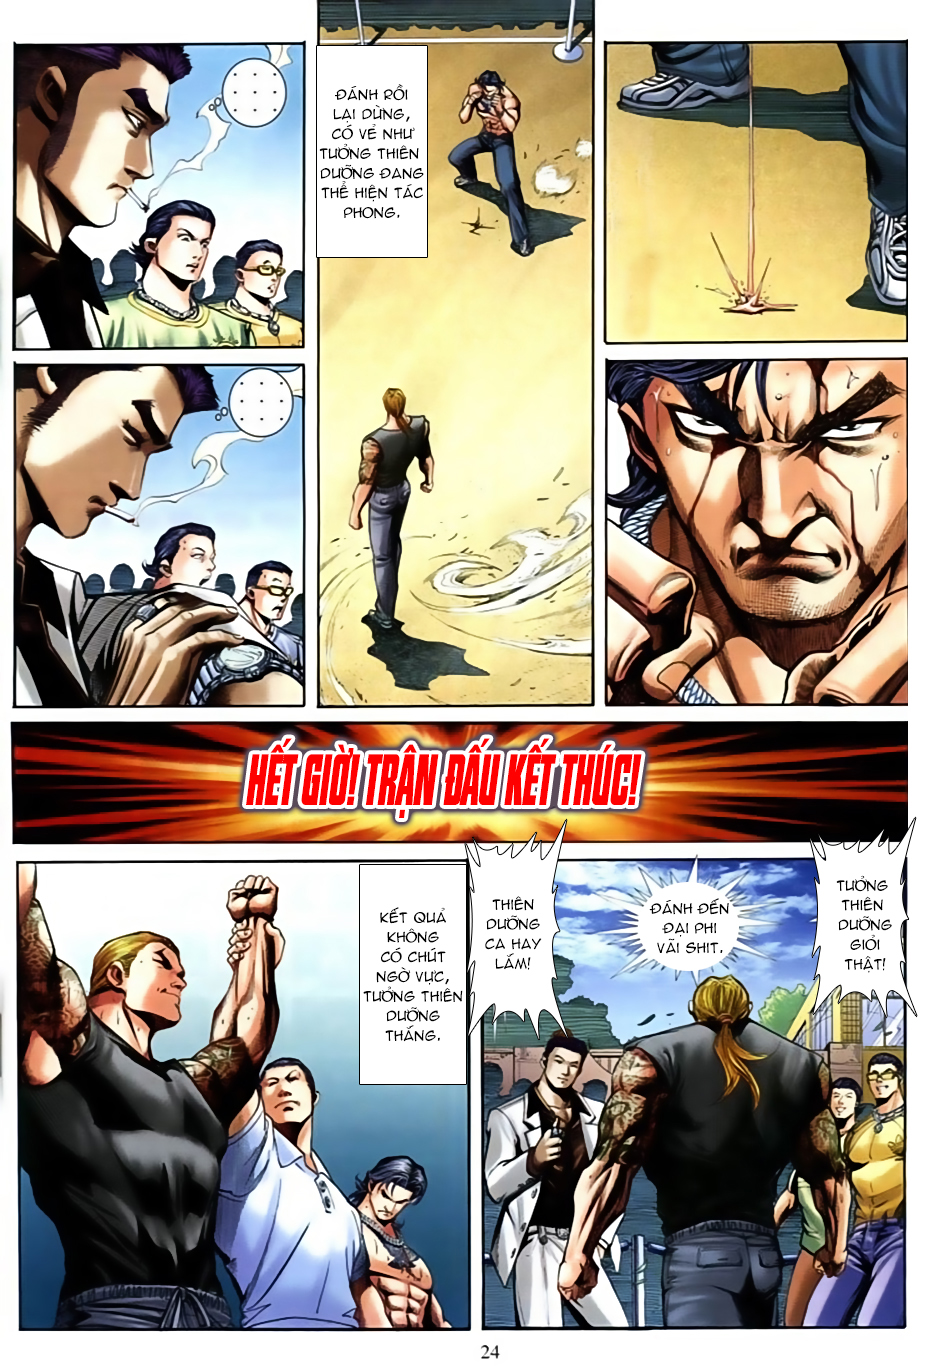 Người Trong Giang Hồ Chap 596 - Truyen.Chap.VN